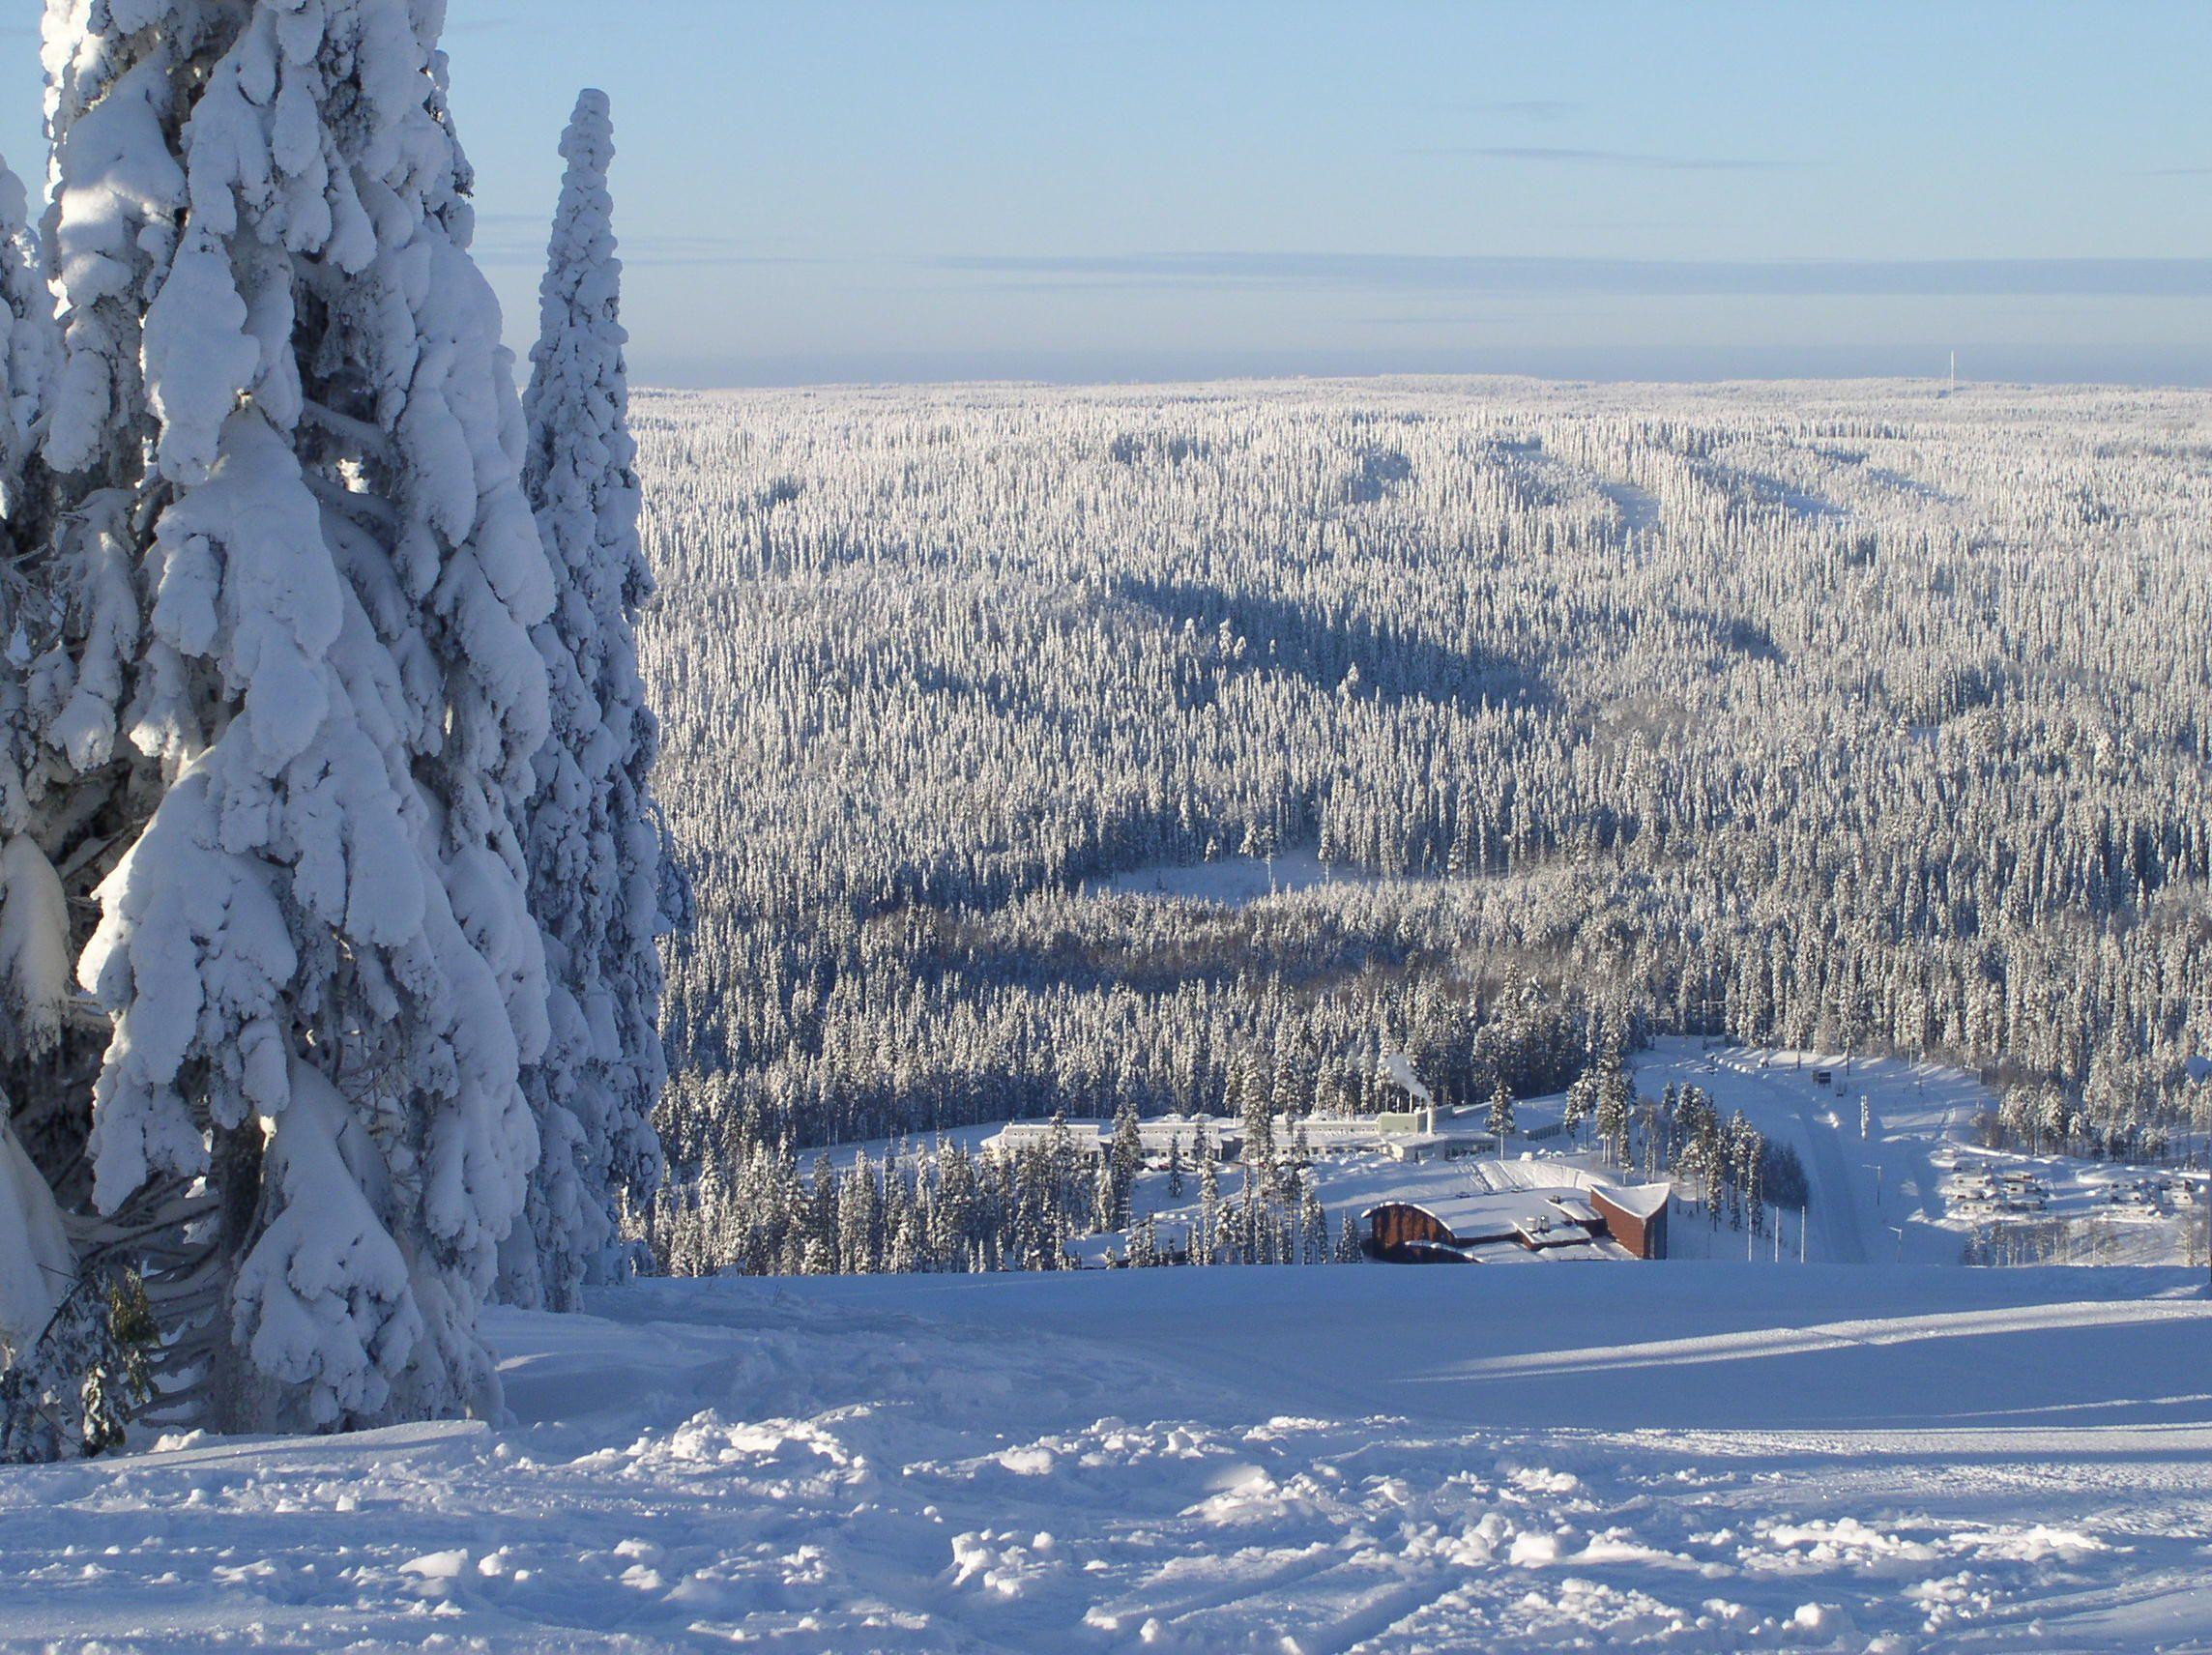 Paljakka In Puolanka My Mom S Home Village In The Very North Of